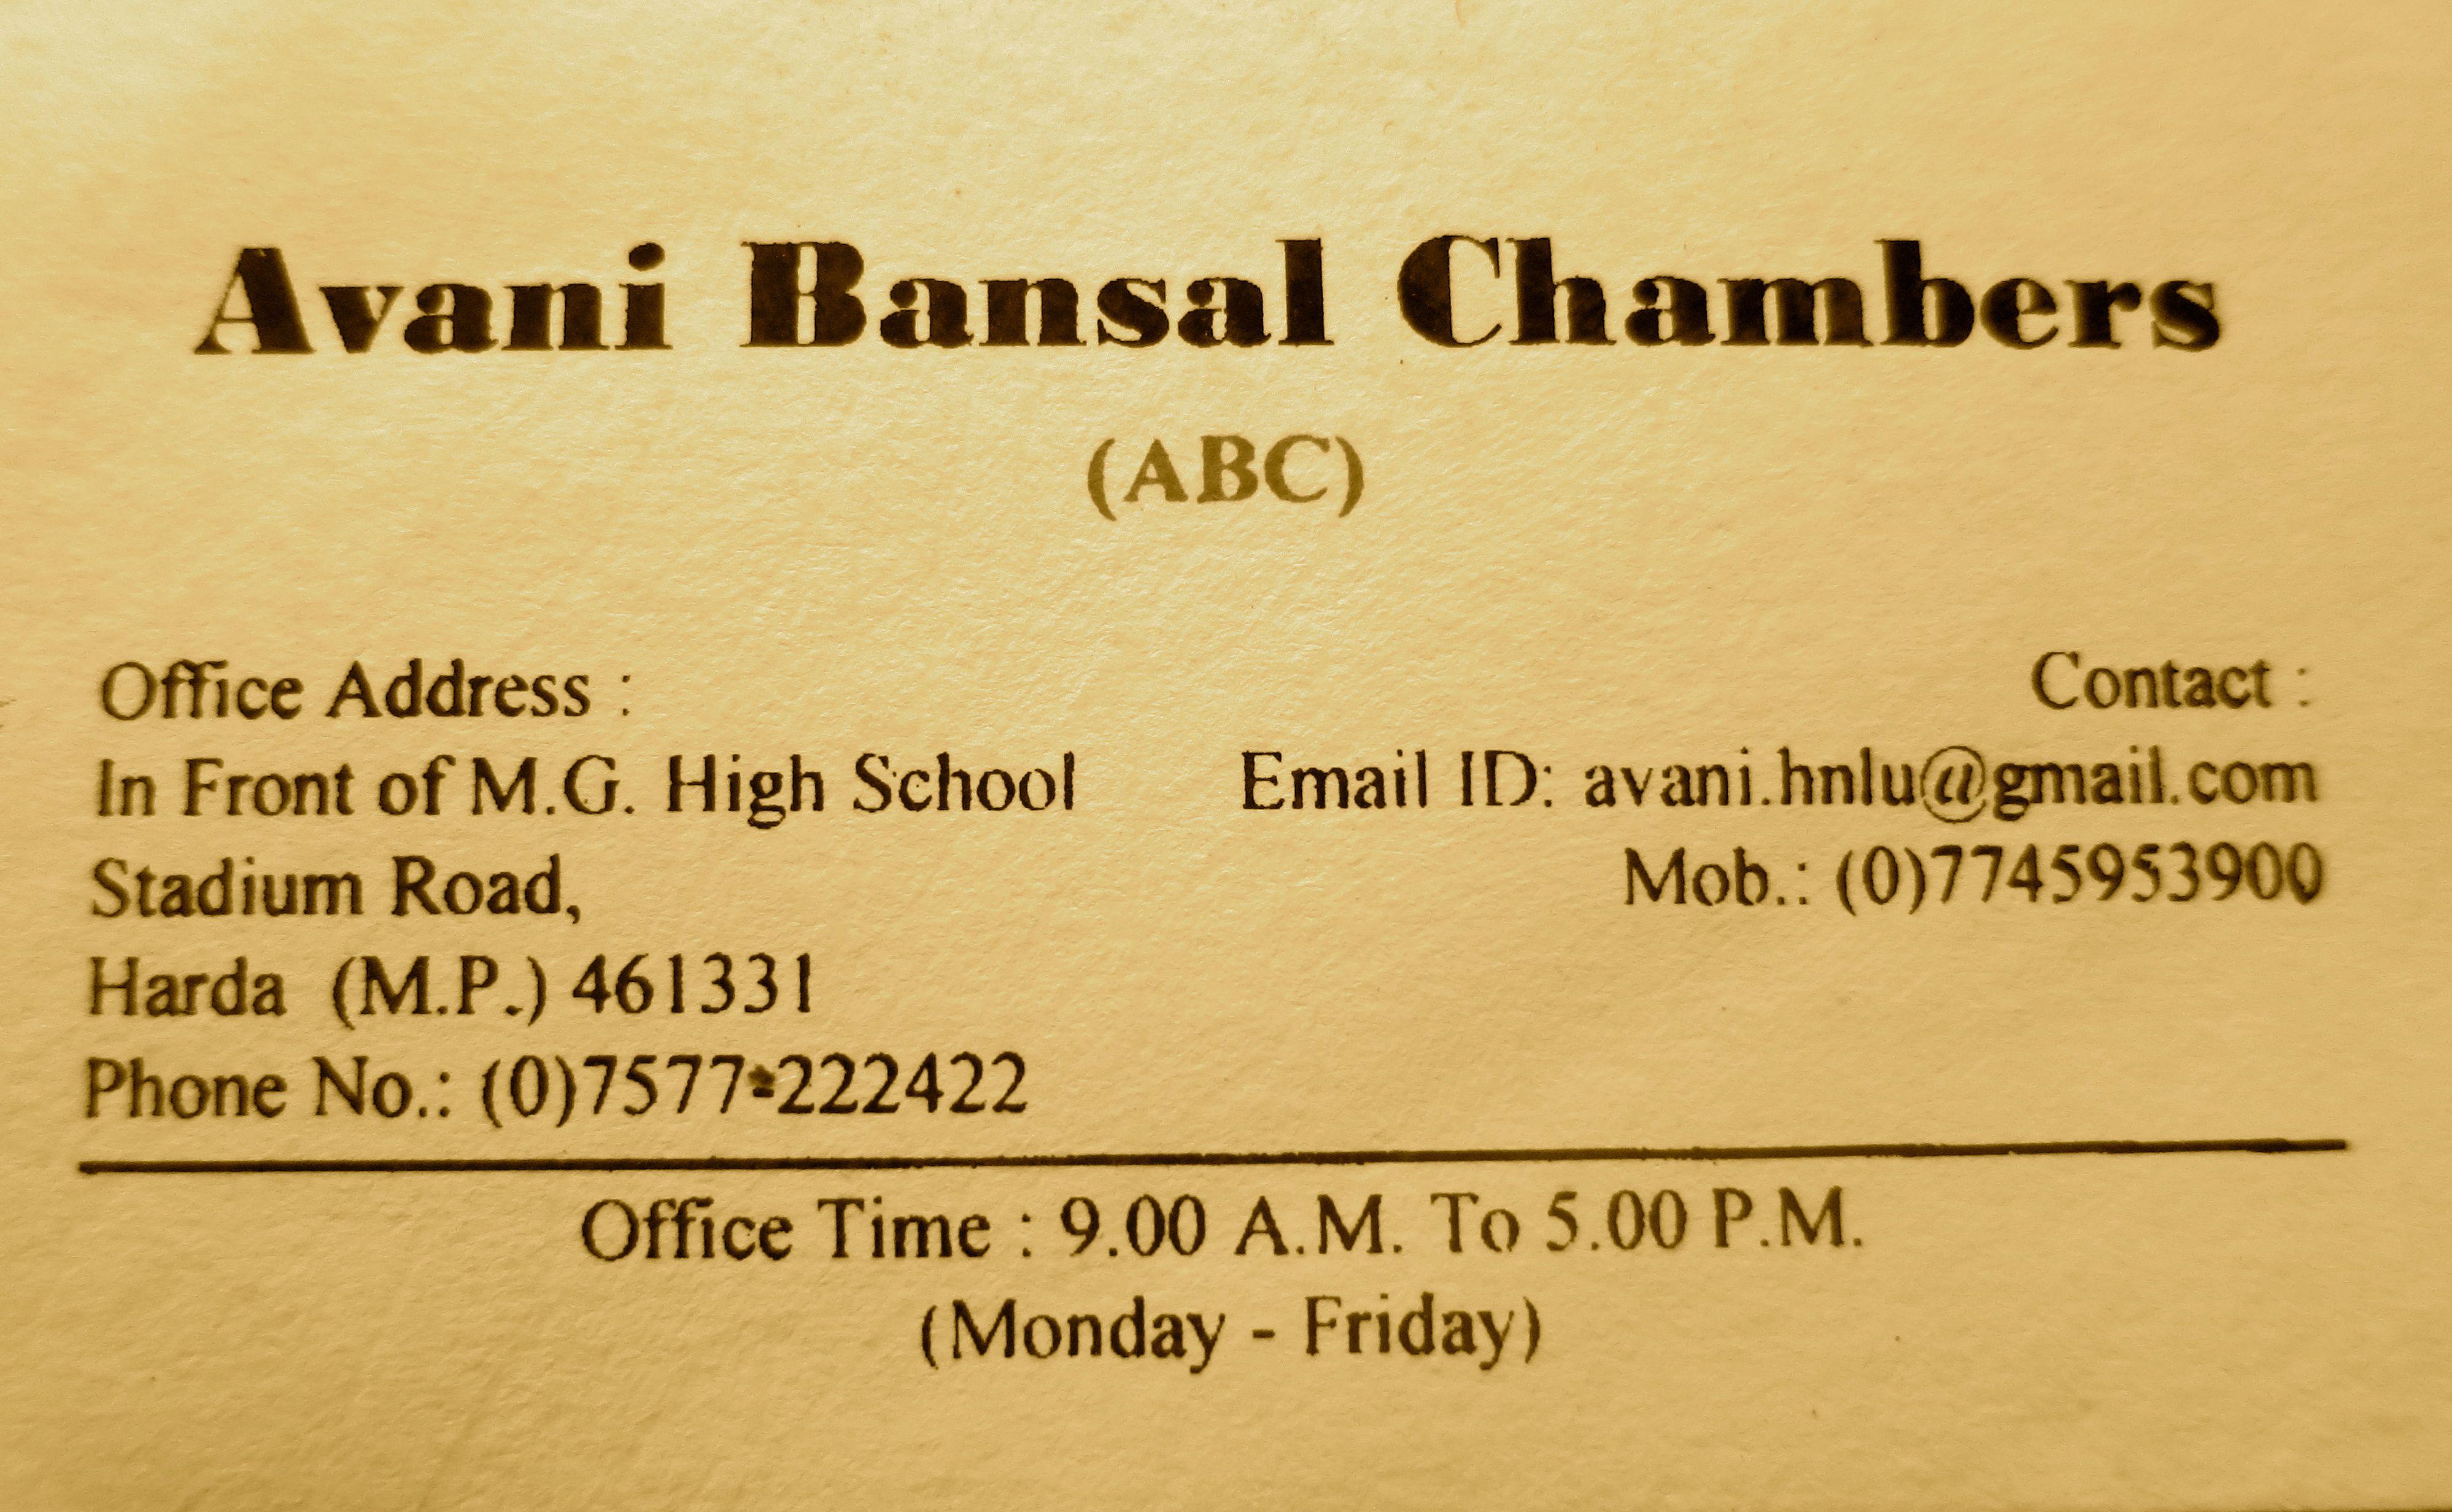 avani bansal chambers job